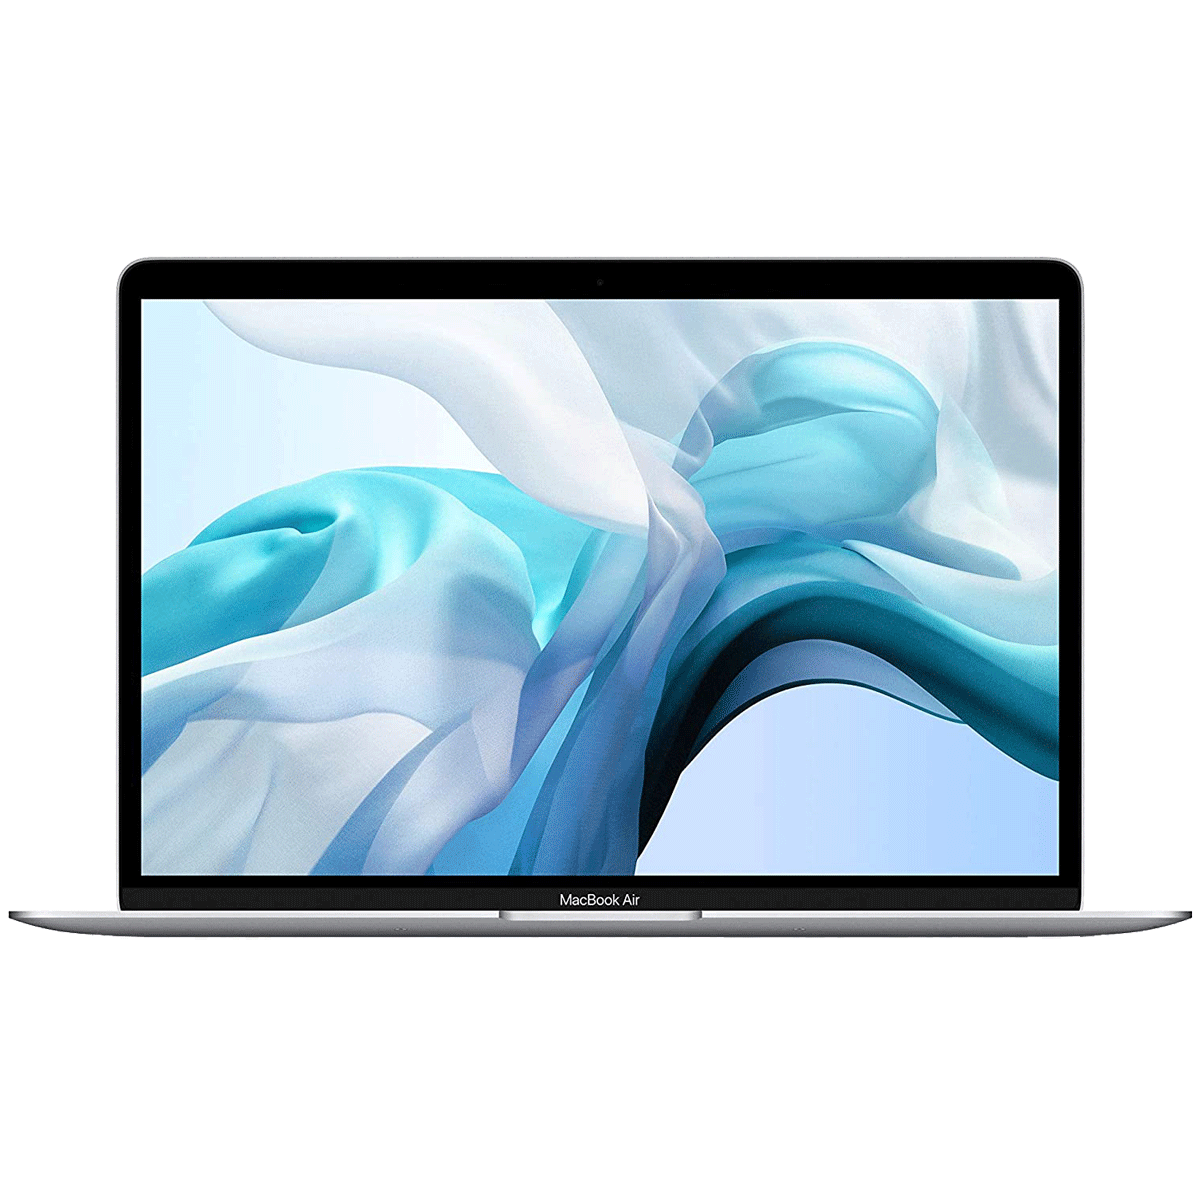 Apple MacBook Air (MGN93HN/A) M1 Chip macOS Big Sur Laptop (8GB RAM, 256GB SSD, Apple M1 GPU, 33.78cm, Silver)_1